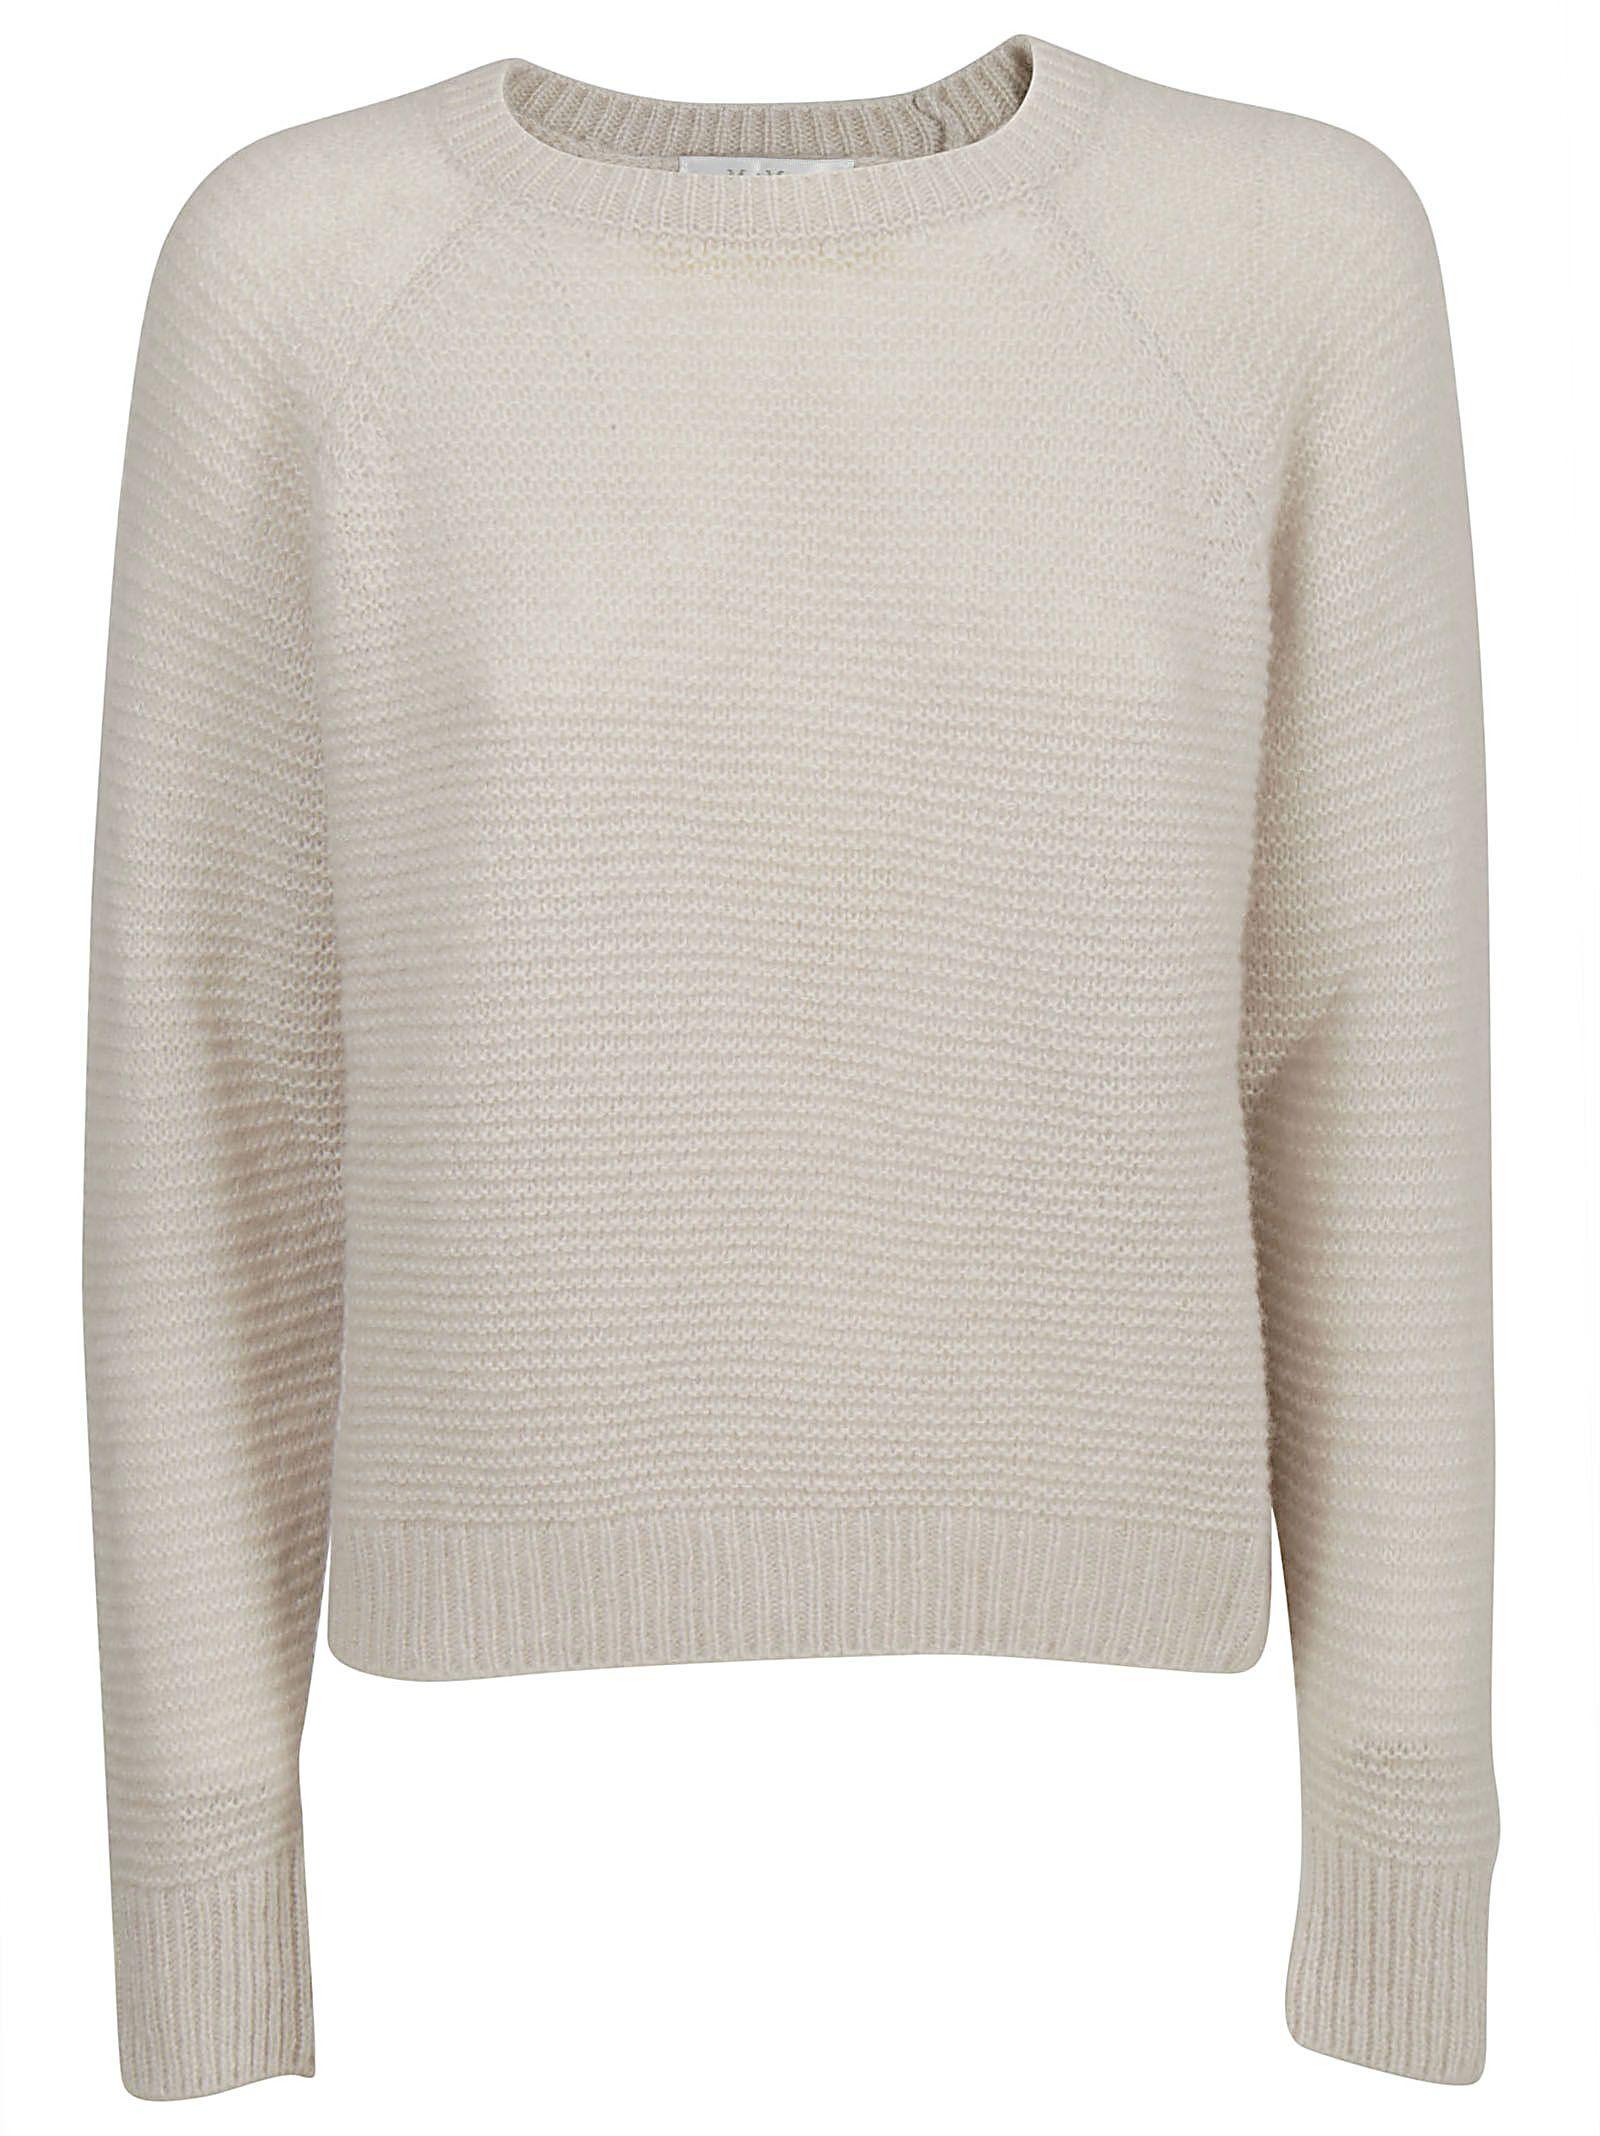 Max Mara Basket Weave Sweater